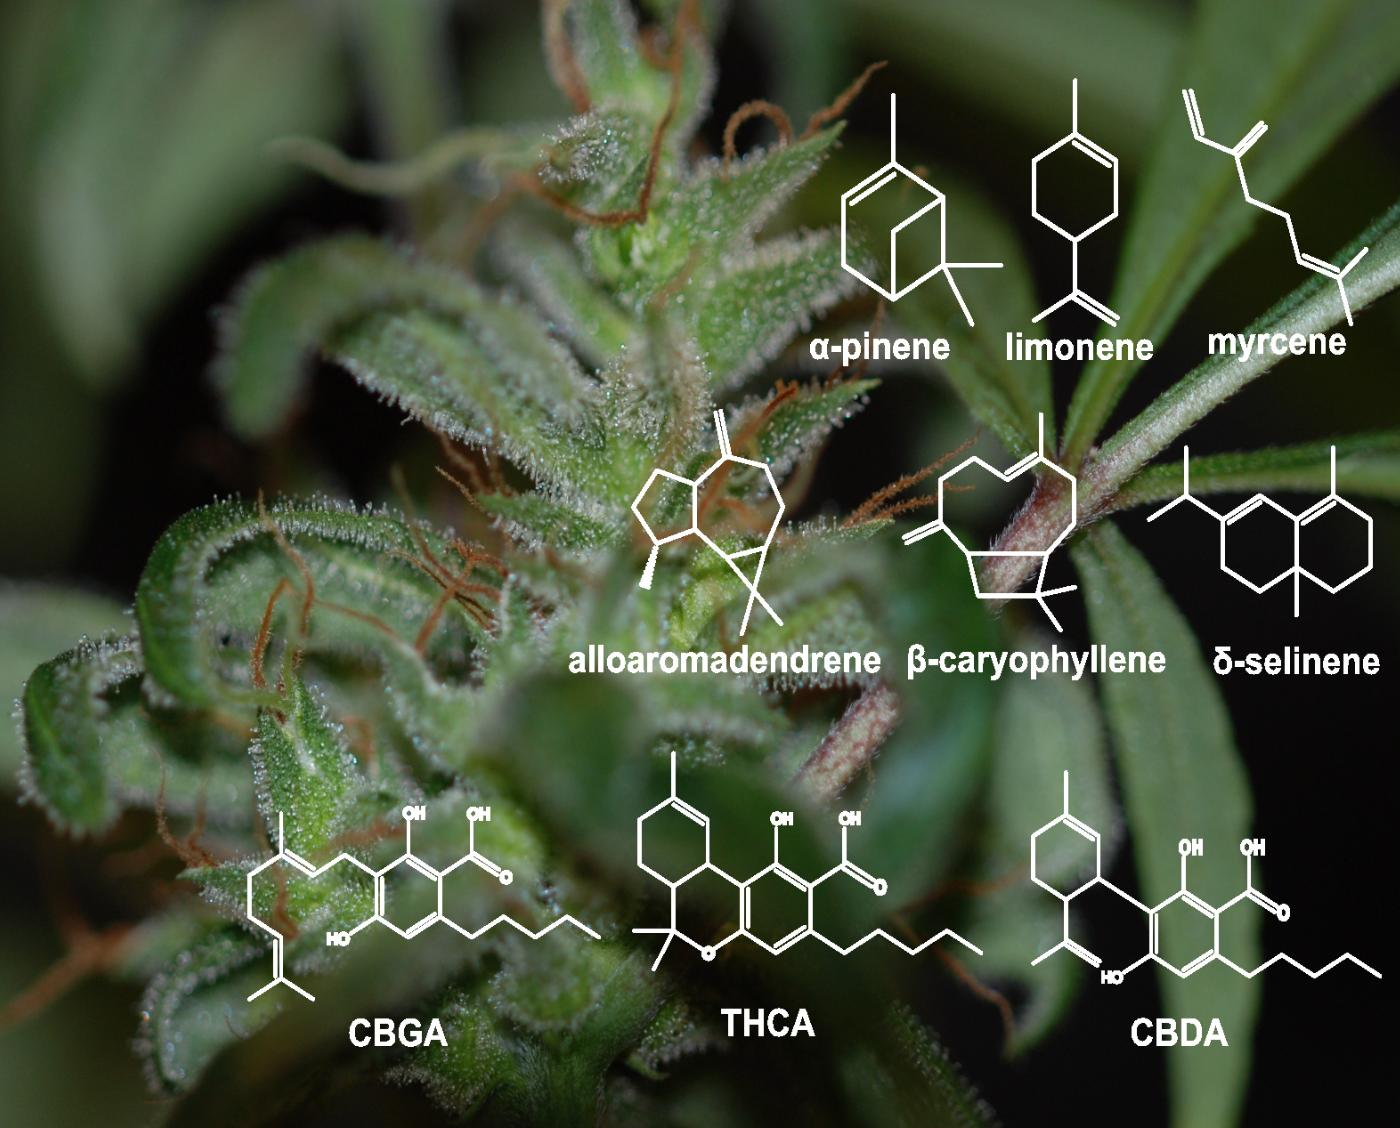 Cannabis resin components: monoterpenes (top row), sesquiterpenes (middle row), and cannabinoids (bottom row). GBGA = cannabigerolic acid; THCA = tetrahydrocannabinolic acid; CBDA = cannabidiolic acid